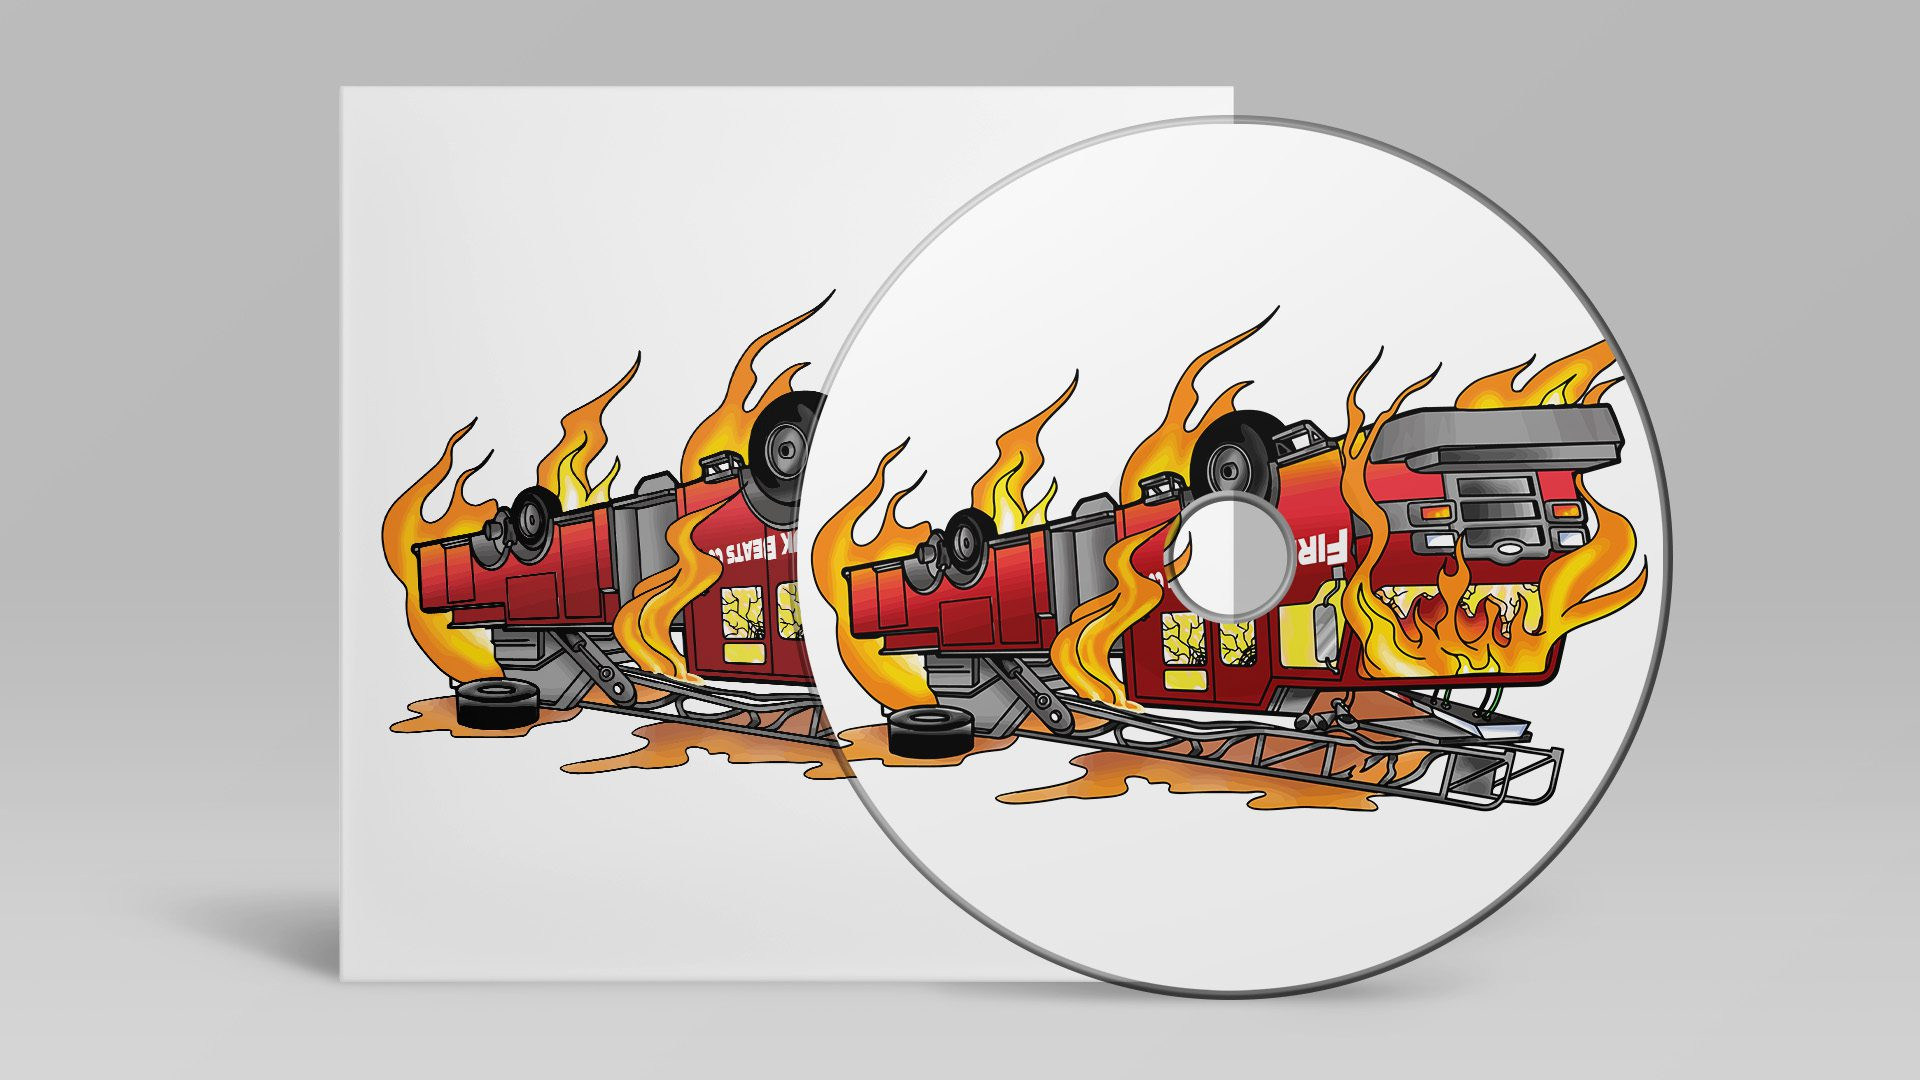 DJ Fireturk - Firetruck Album Art Design Mockup 01